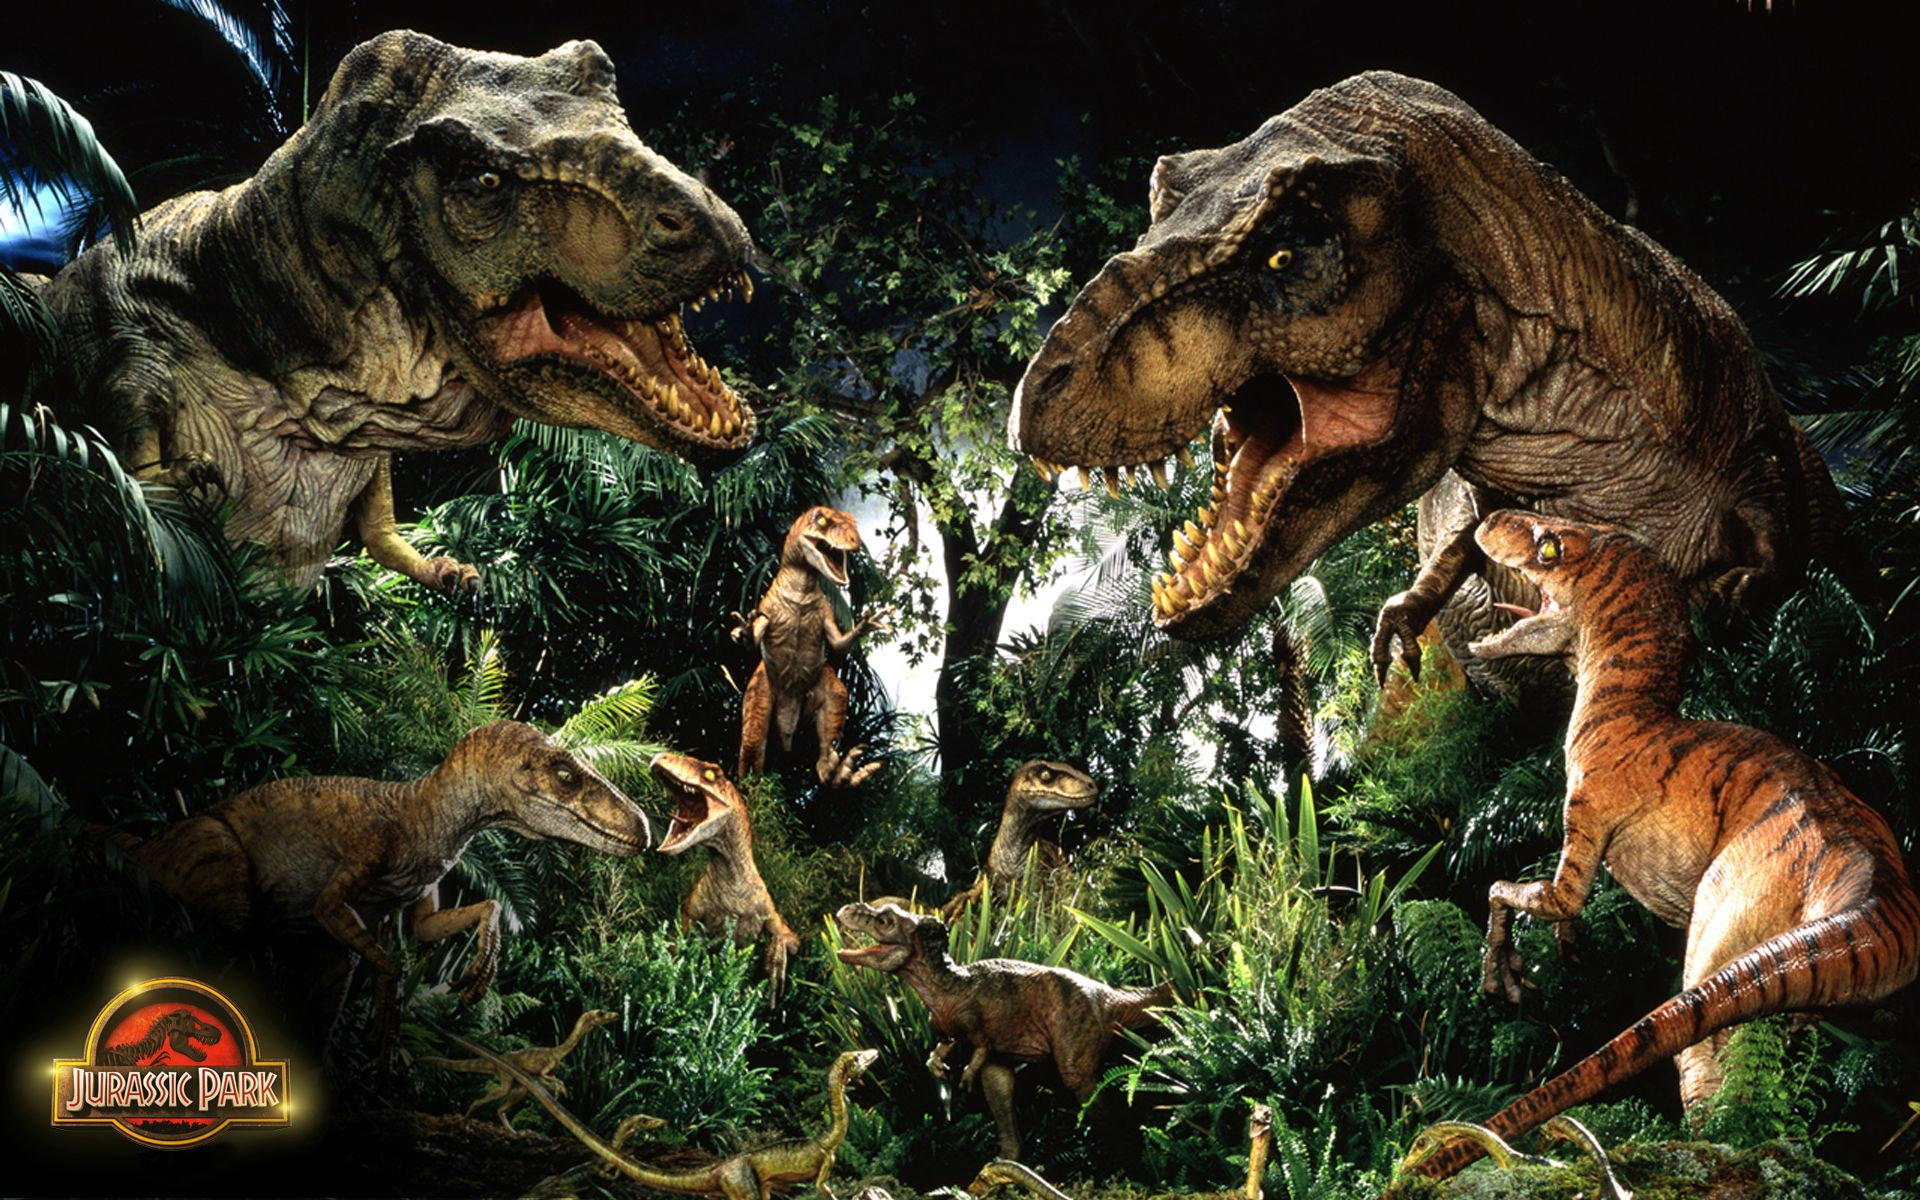 Elicottero Jurassic Park : Jurassic park t rex wallpaper wallpapersafari